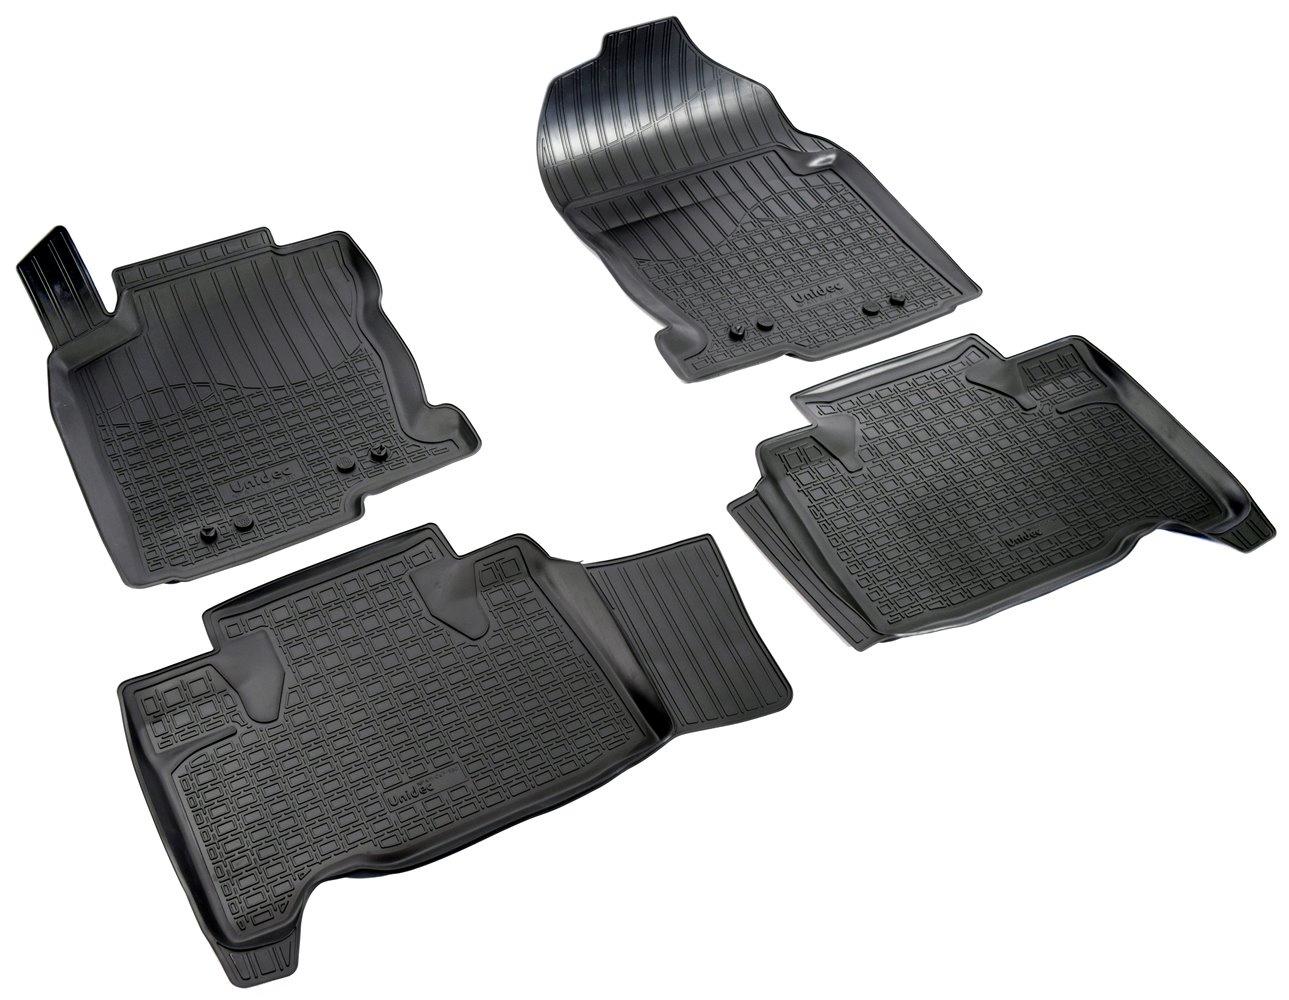 Коврики в салон автомобиля Norplast для Lexus NX (2014), NPA11-C47-580, черный nusun nx 180